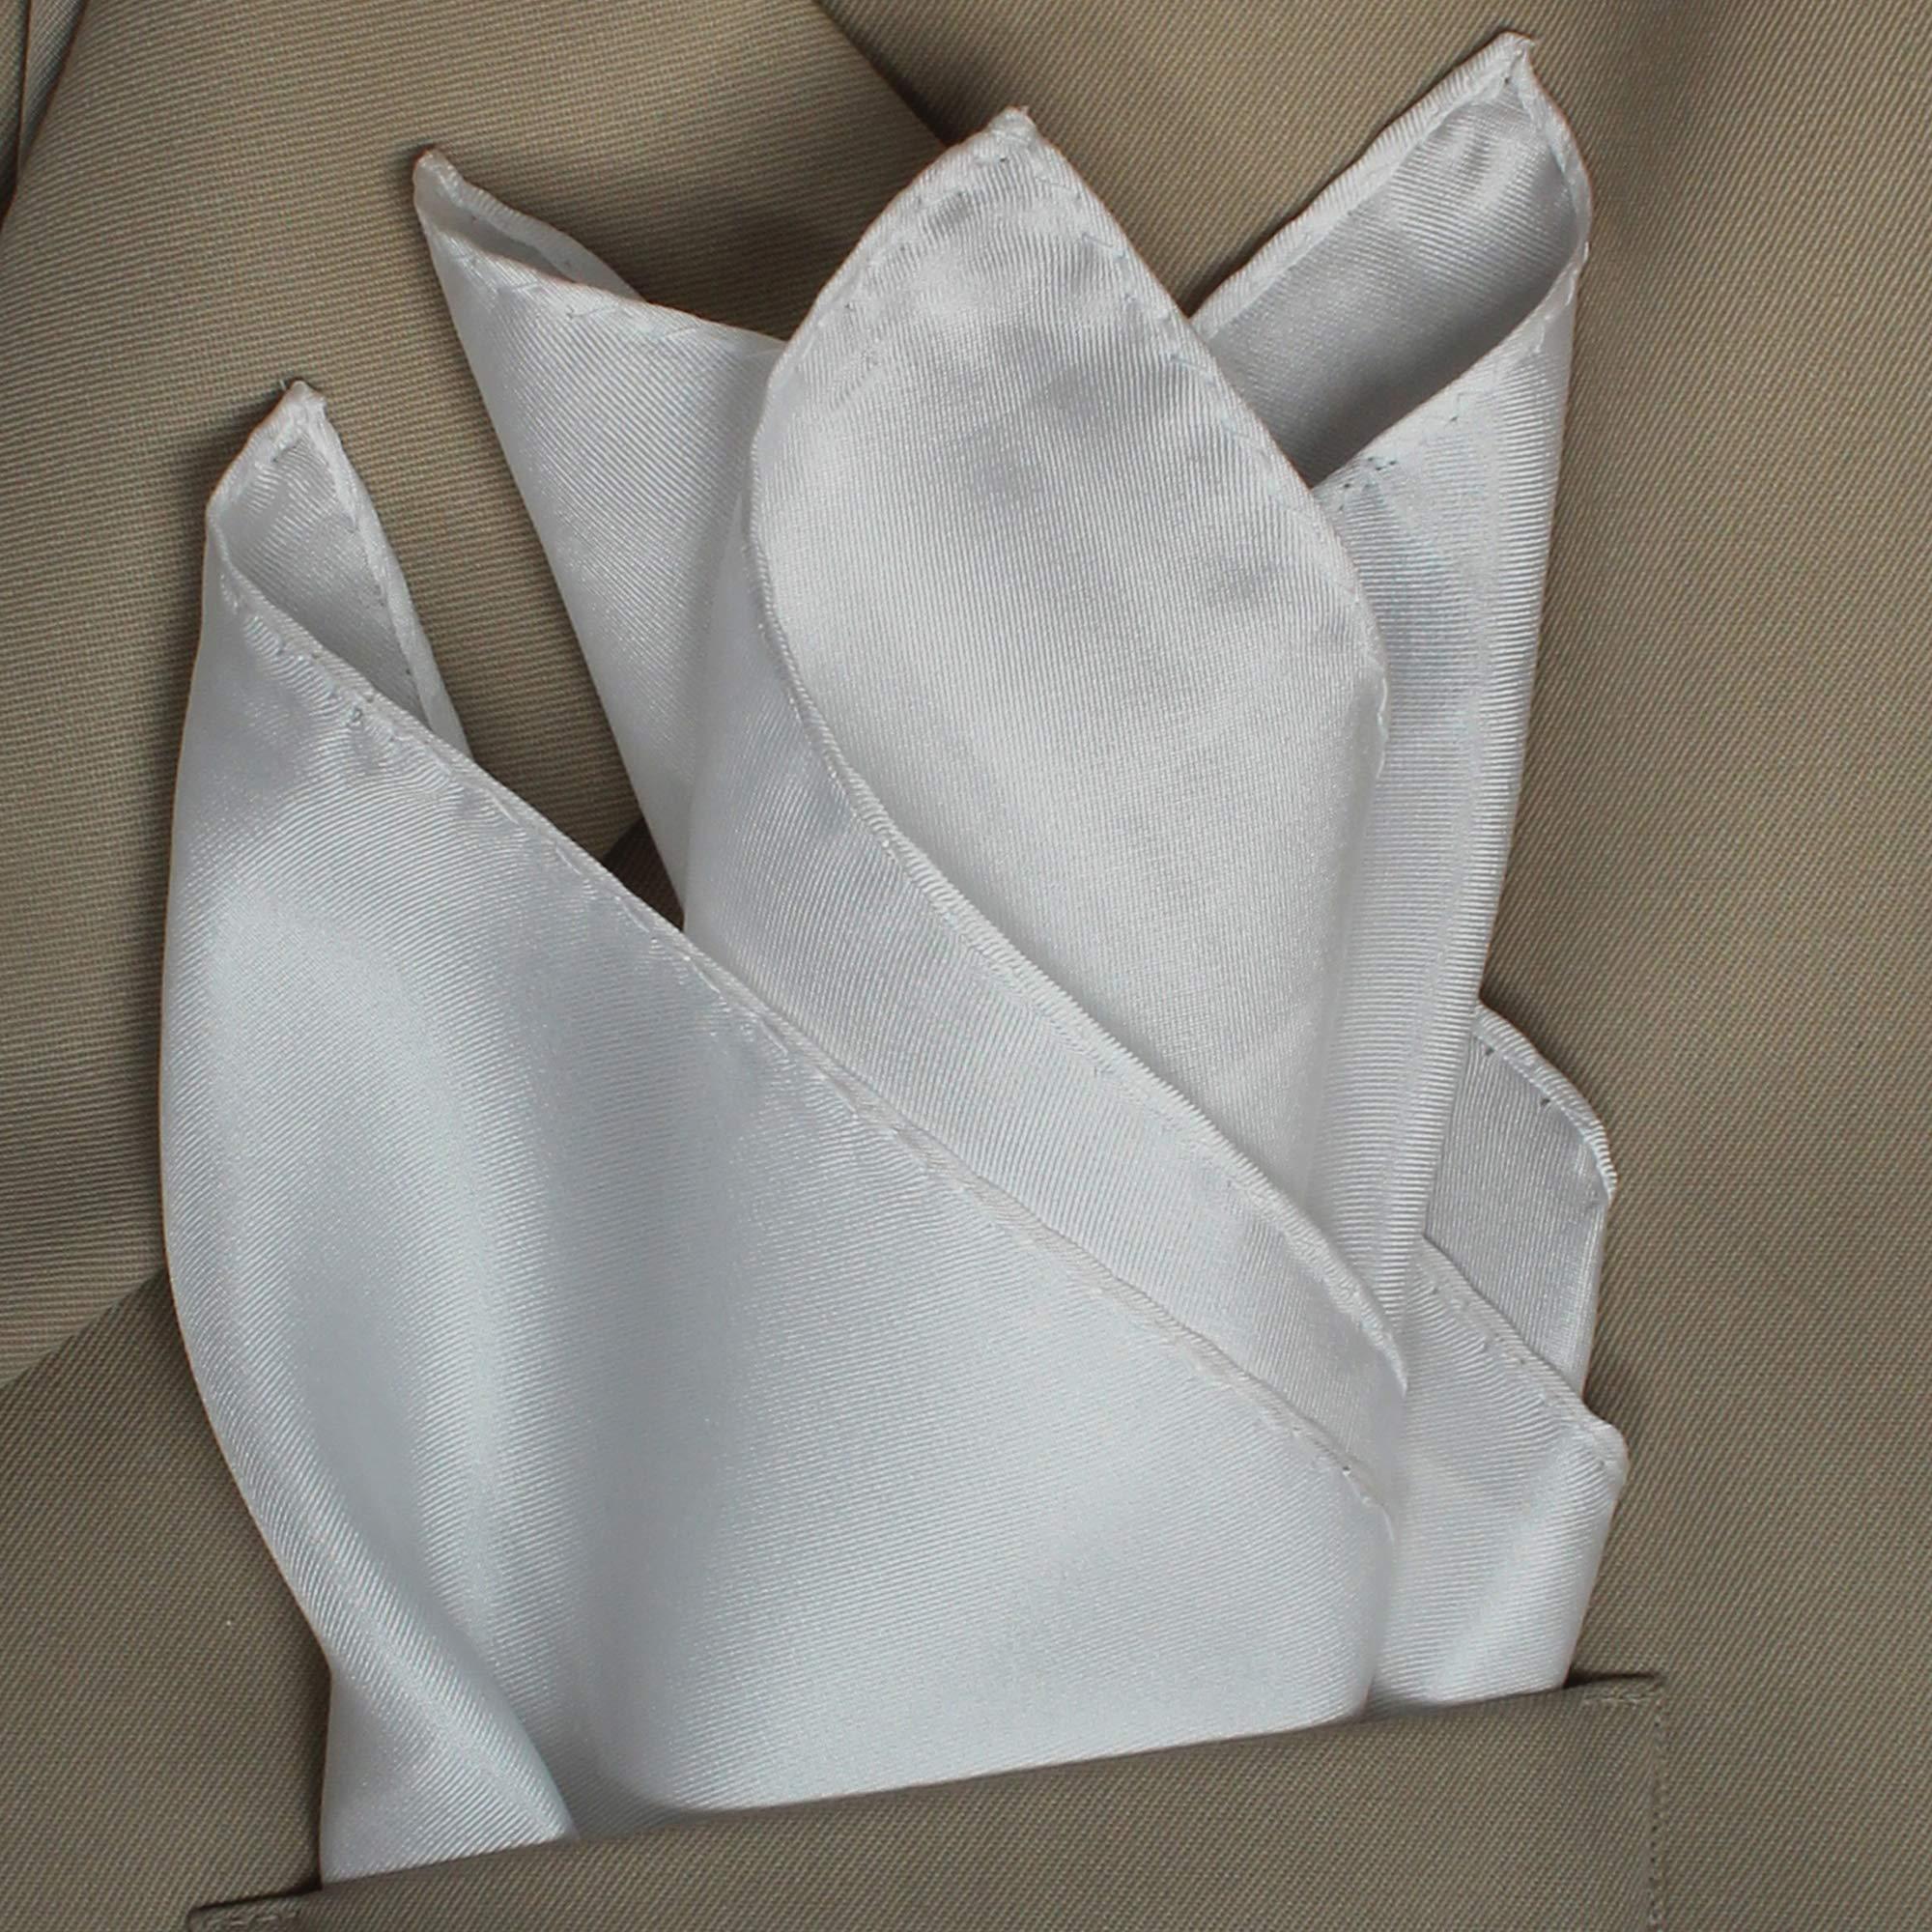 Fine White Silk Pocket Square by Royal Silk - Full Sized 17'' x 17''